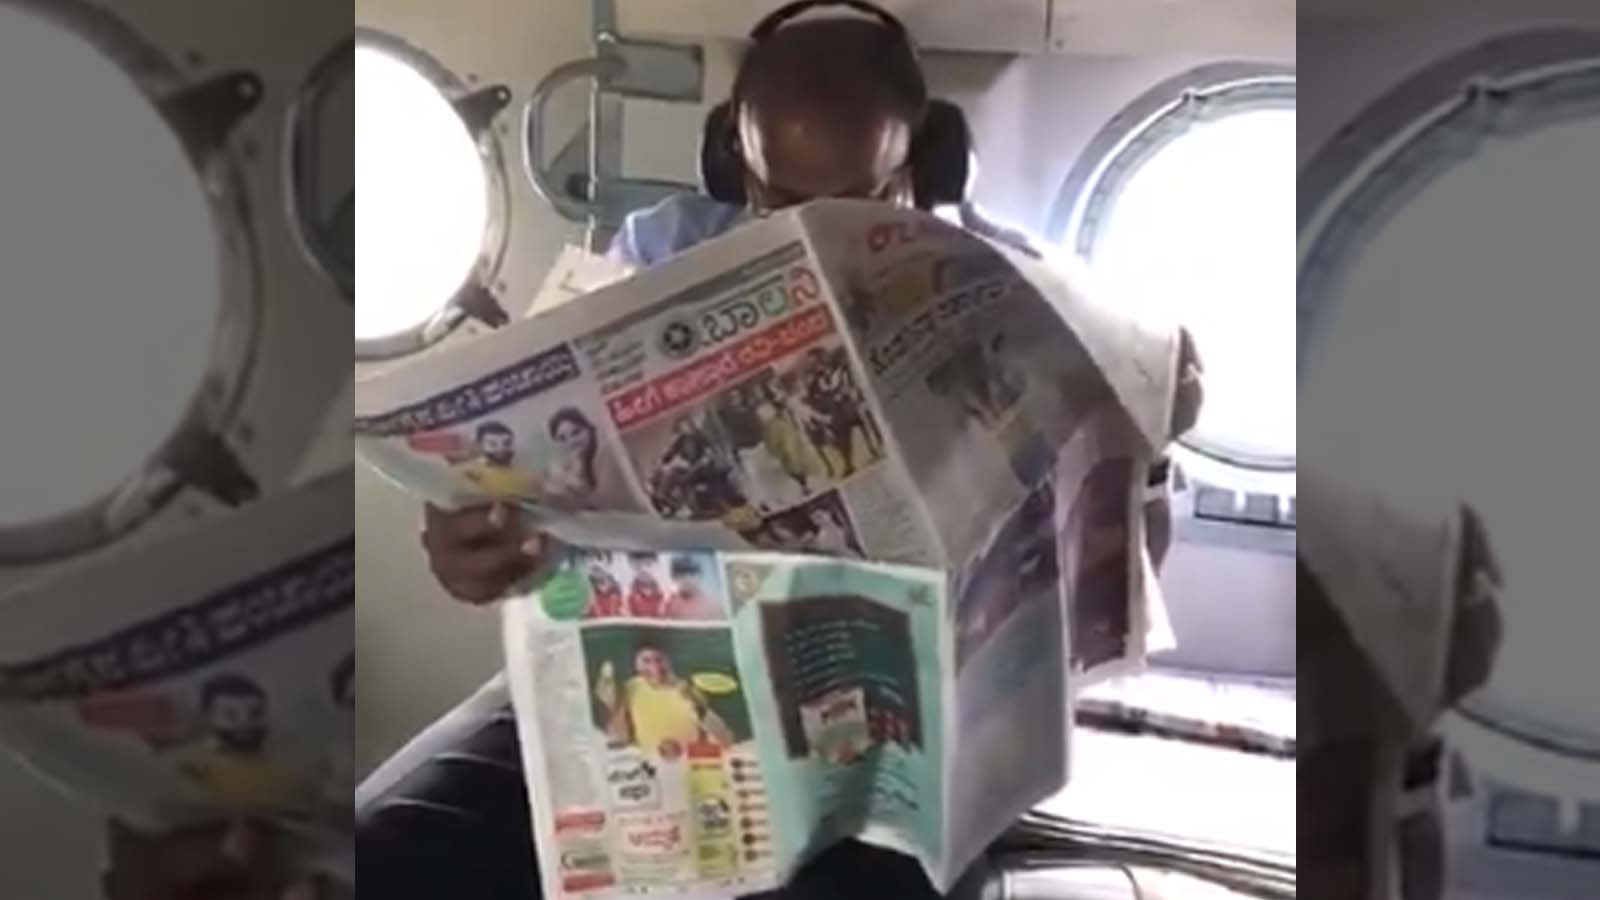 Karnataka, CM, Kumaraswamy, read, newspaper, Kerala, flood, aerial, survey, NewsMobile, Fact Check, Fact Checker, NM, India, Mobile News